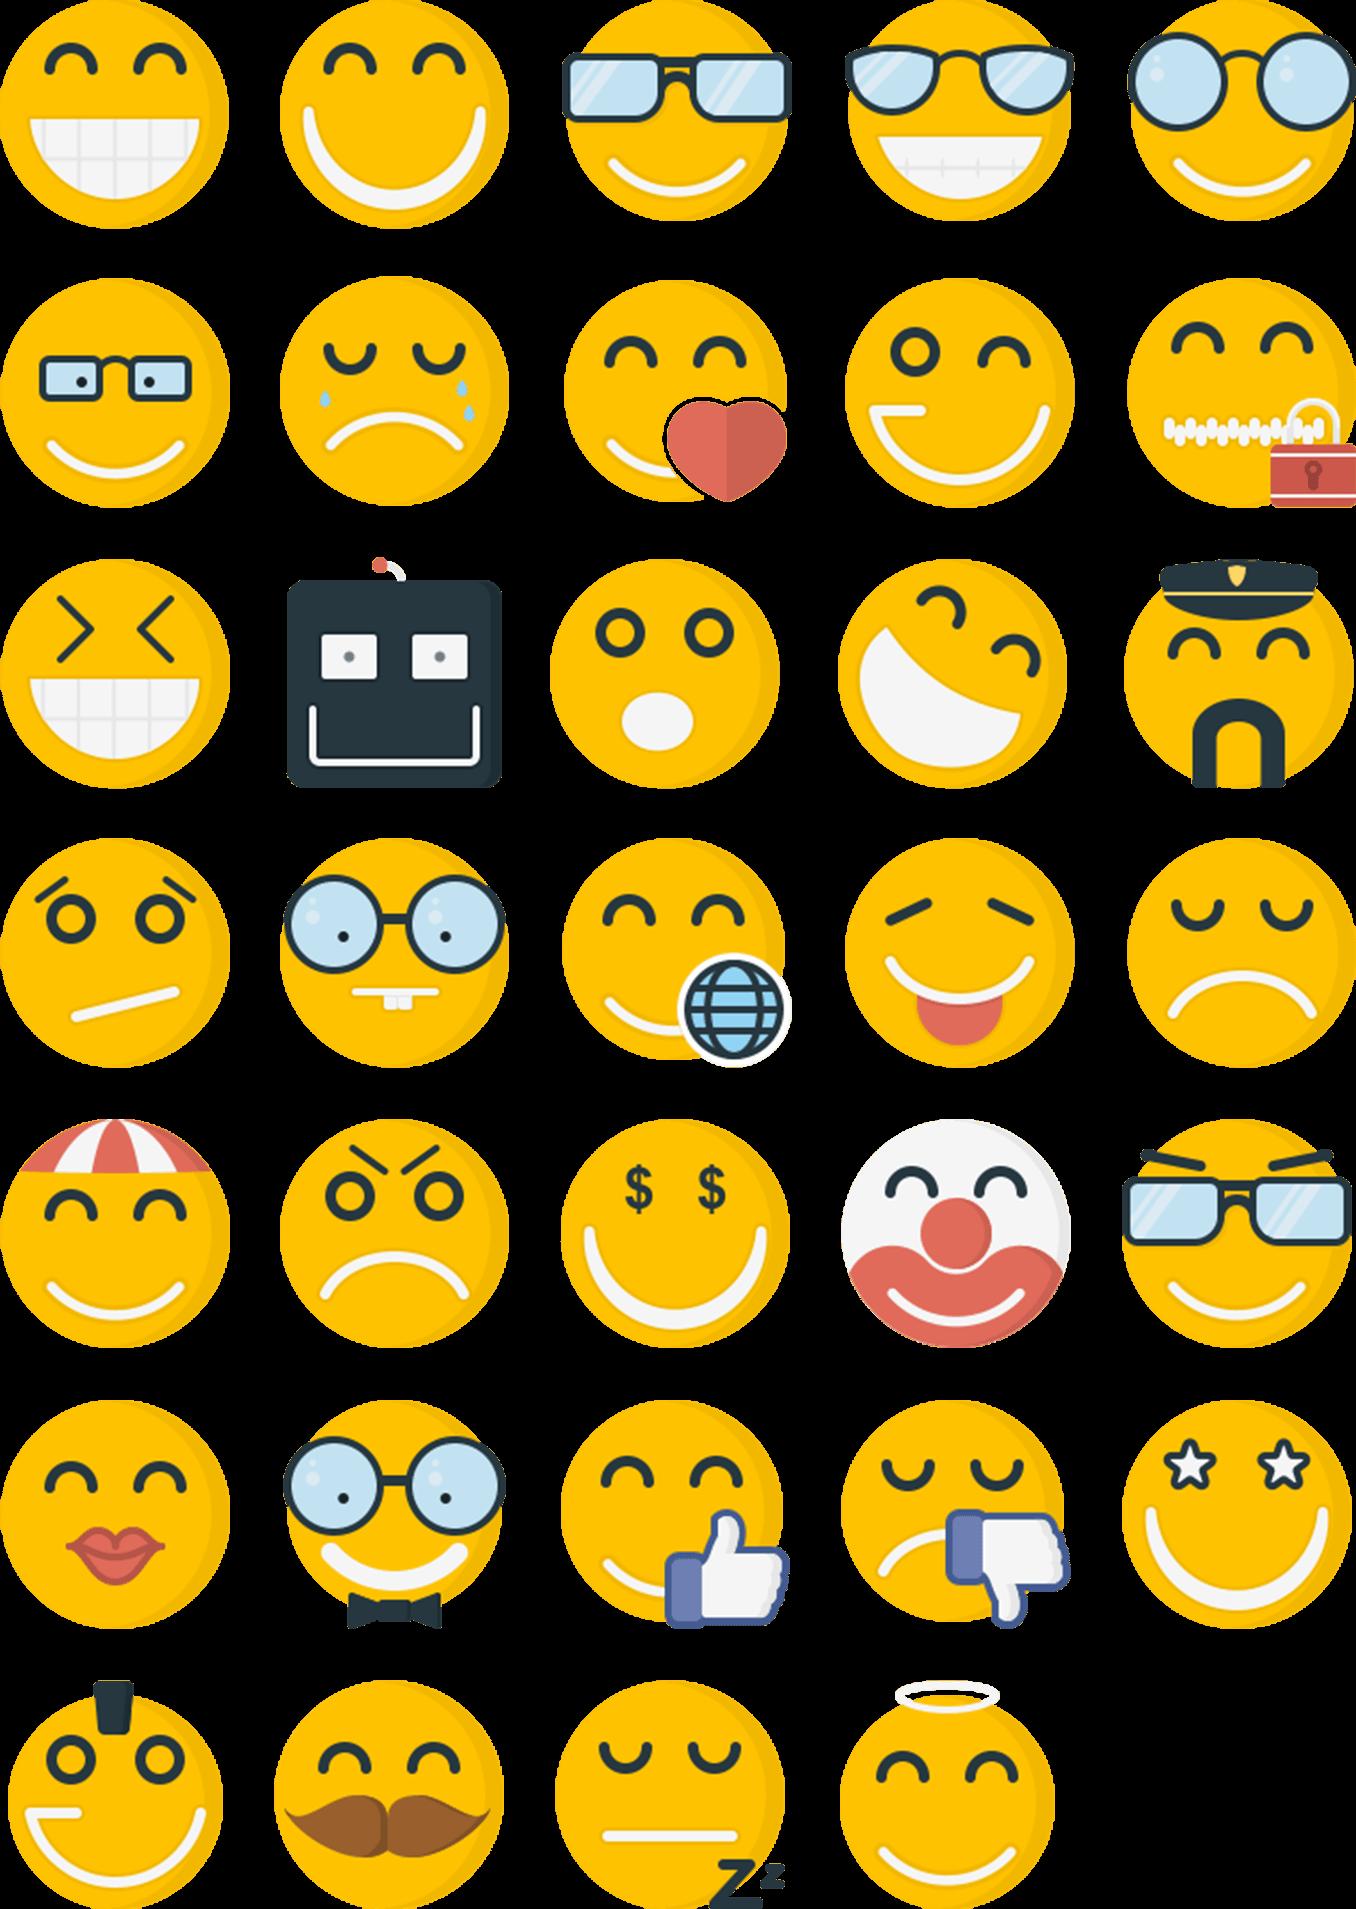 Freebies Free Emoticon Flat Icons Icons Fribly